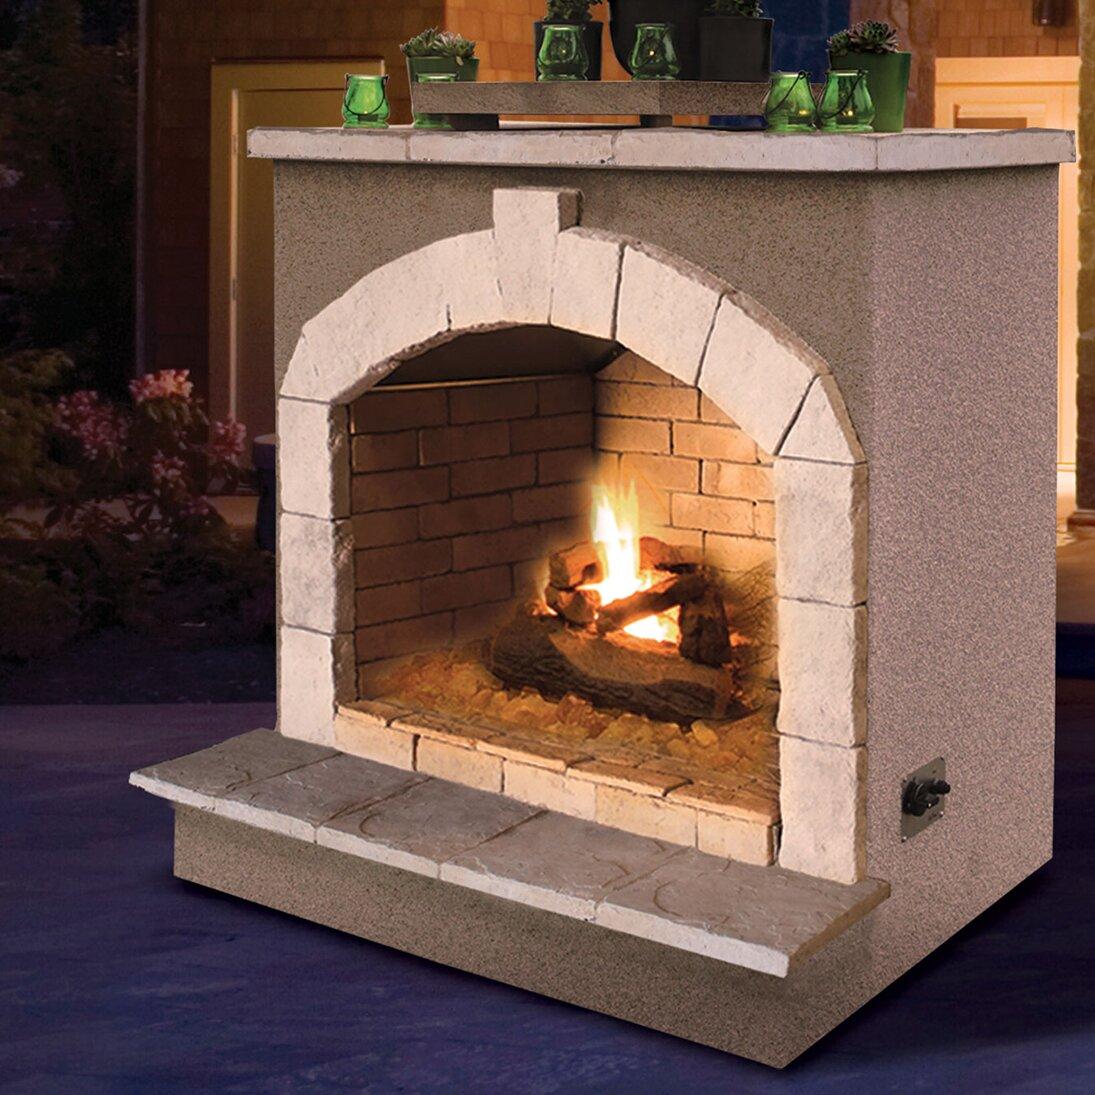 CalFlame Propane Gas Outdoor Fireplace & Reviews